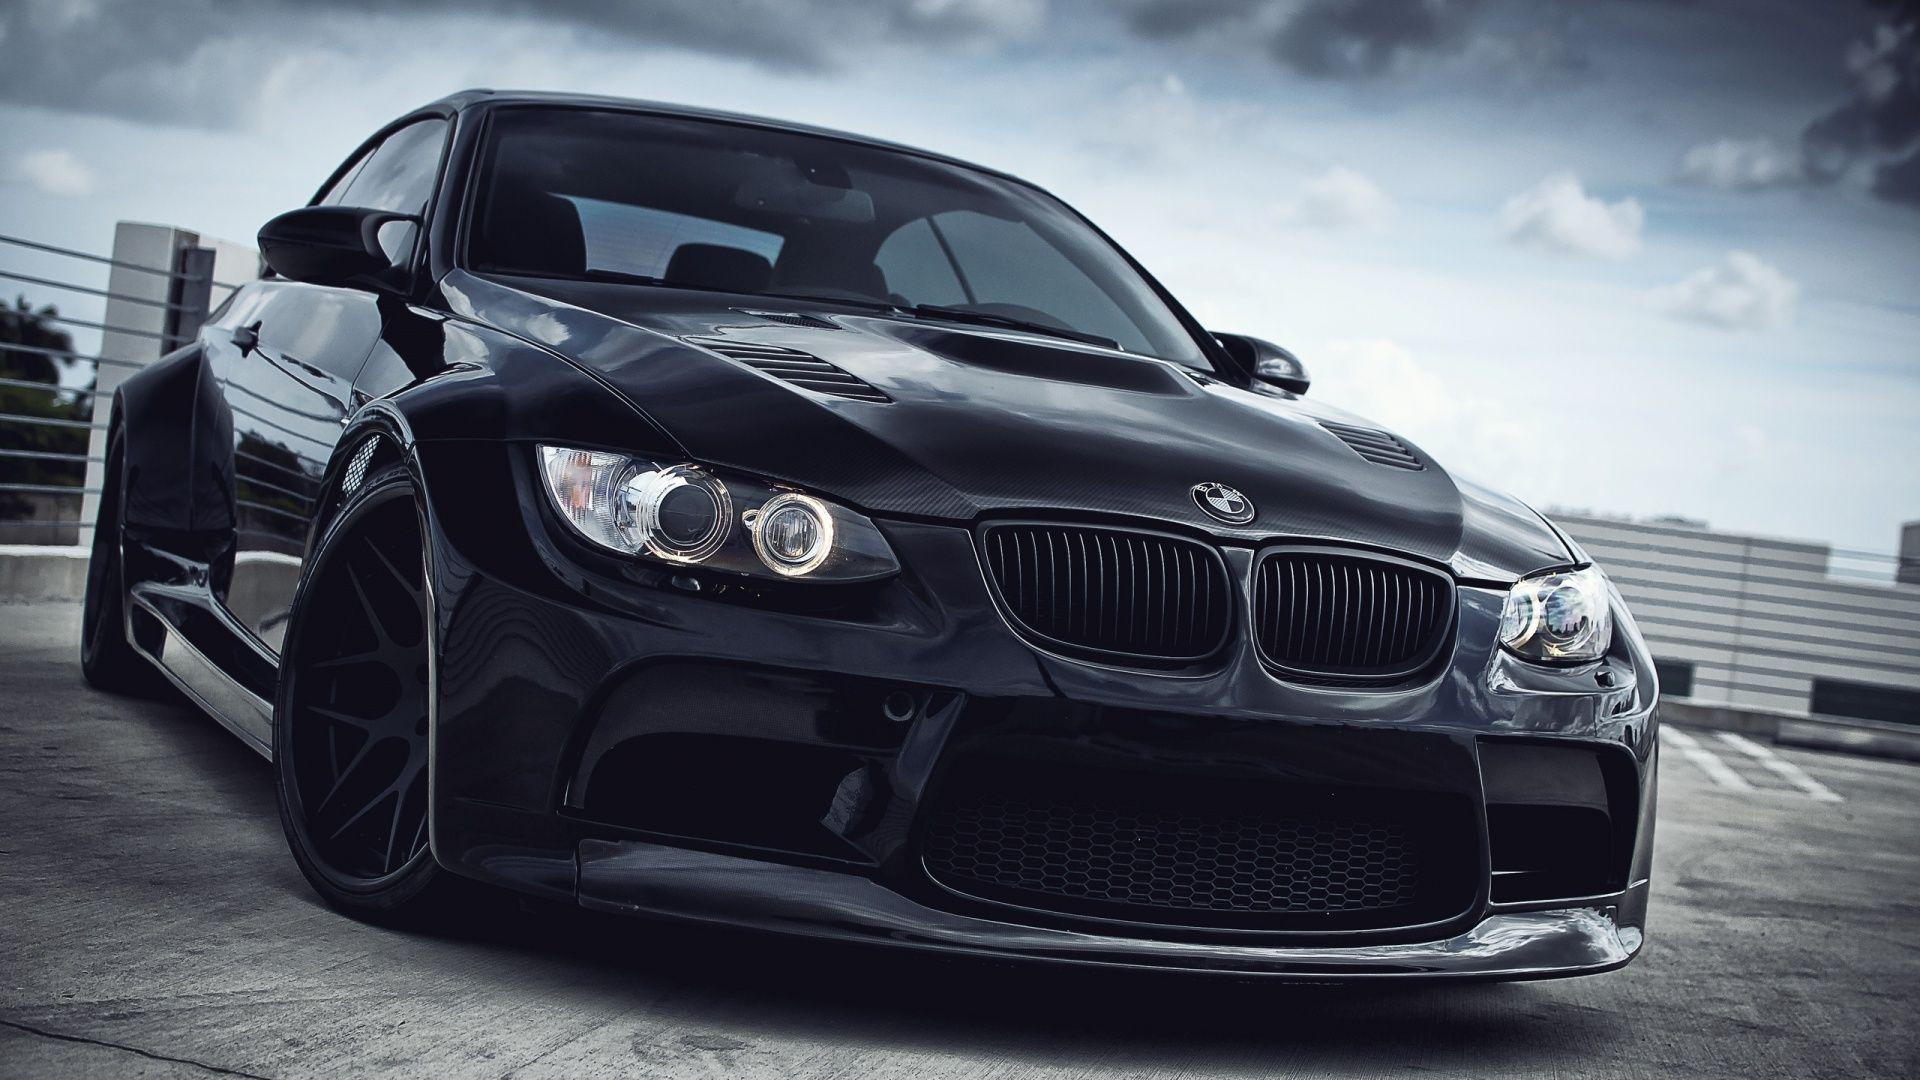 BMW M3 Wallpaper Windows Black Costom Wallpaper | Cars